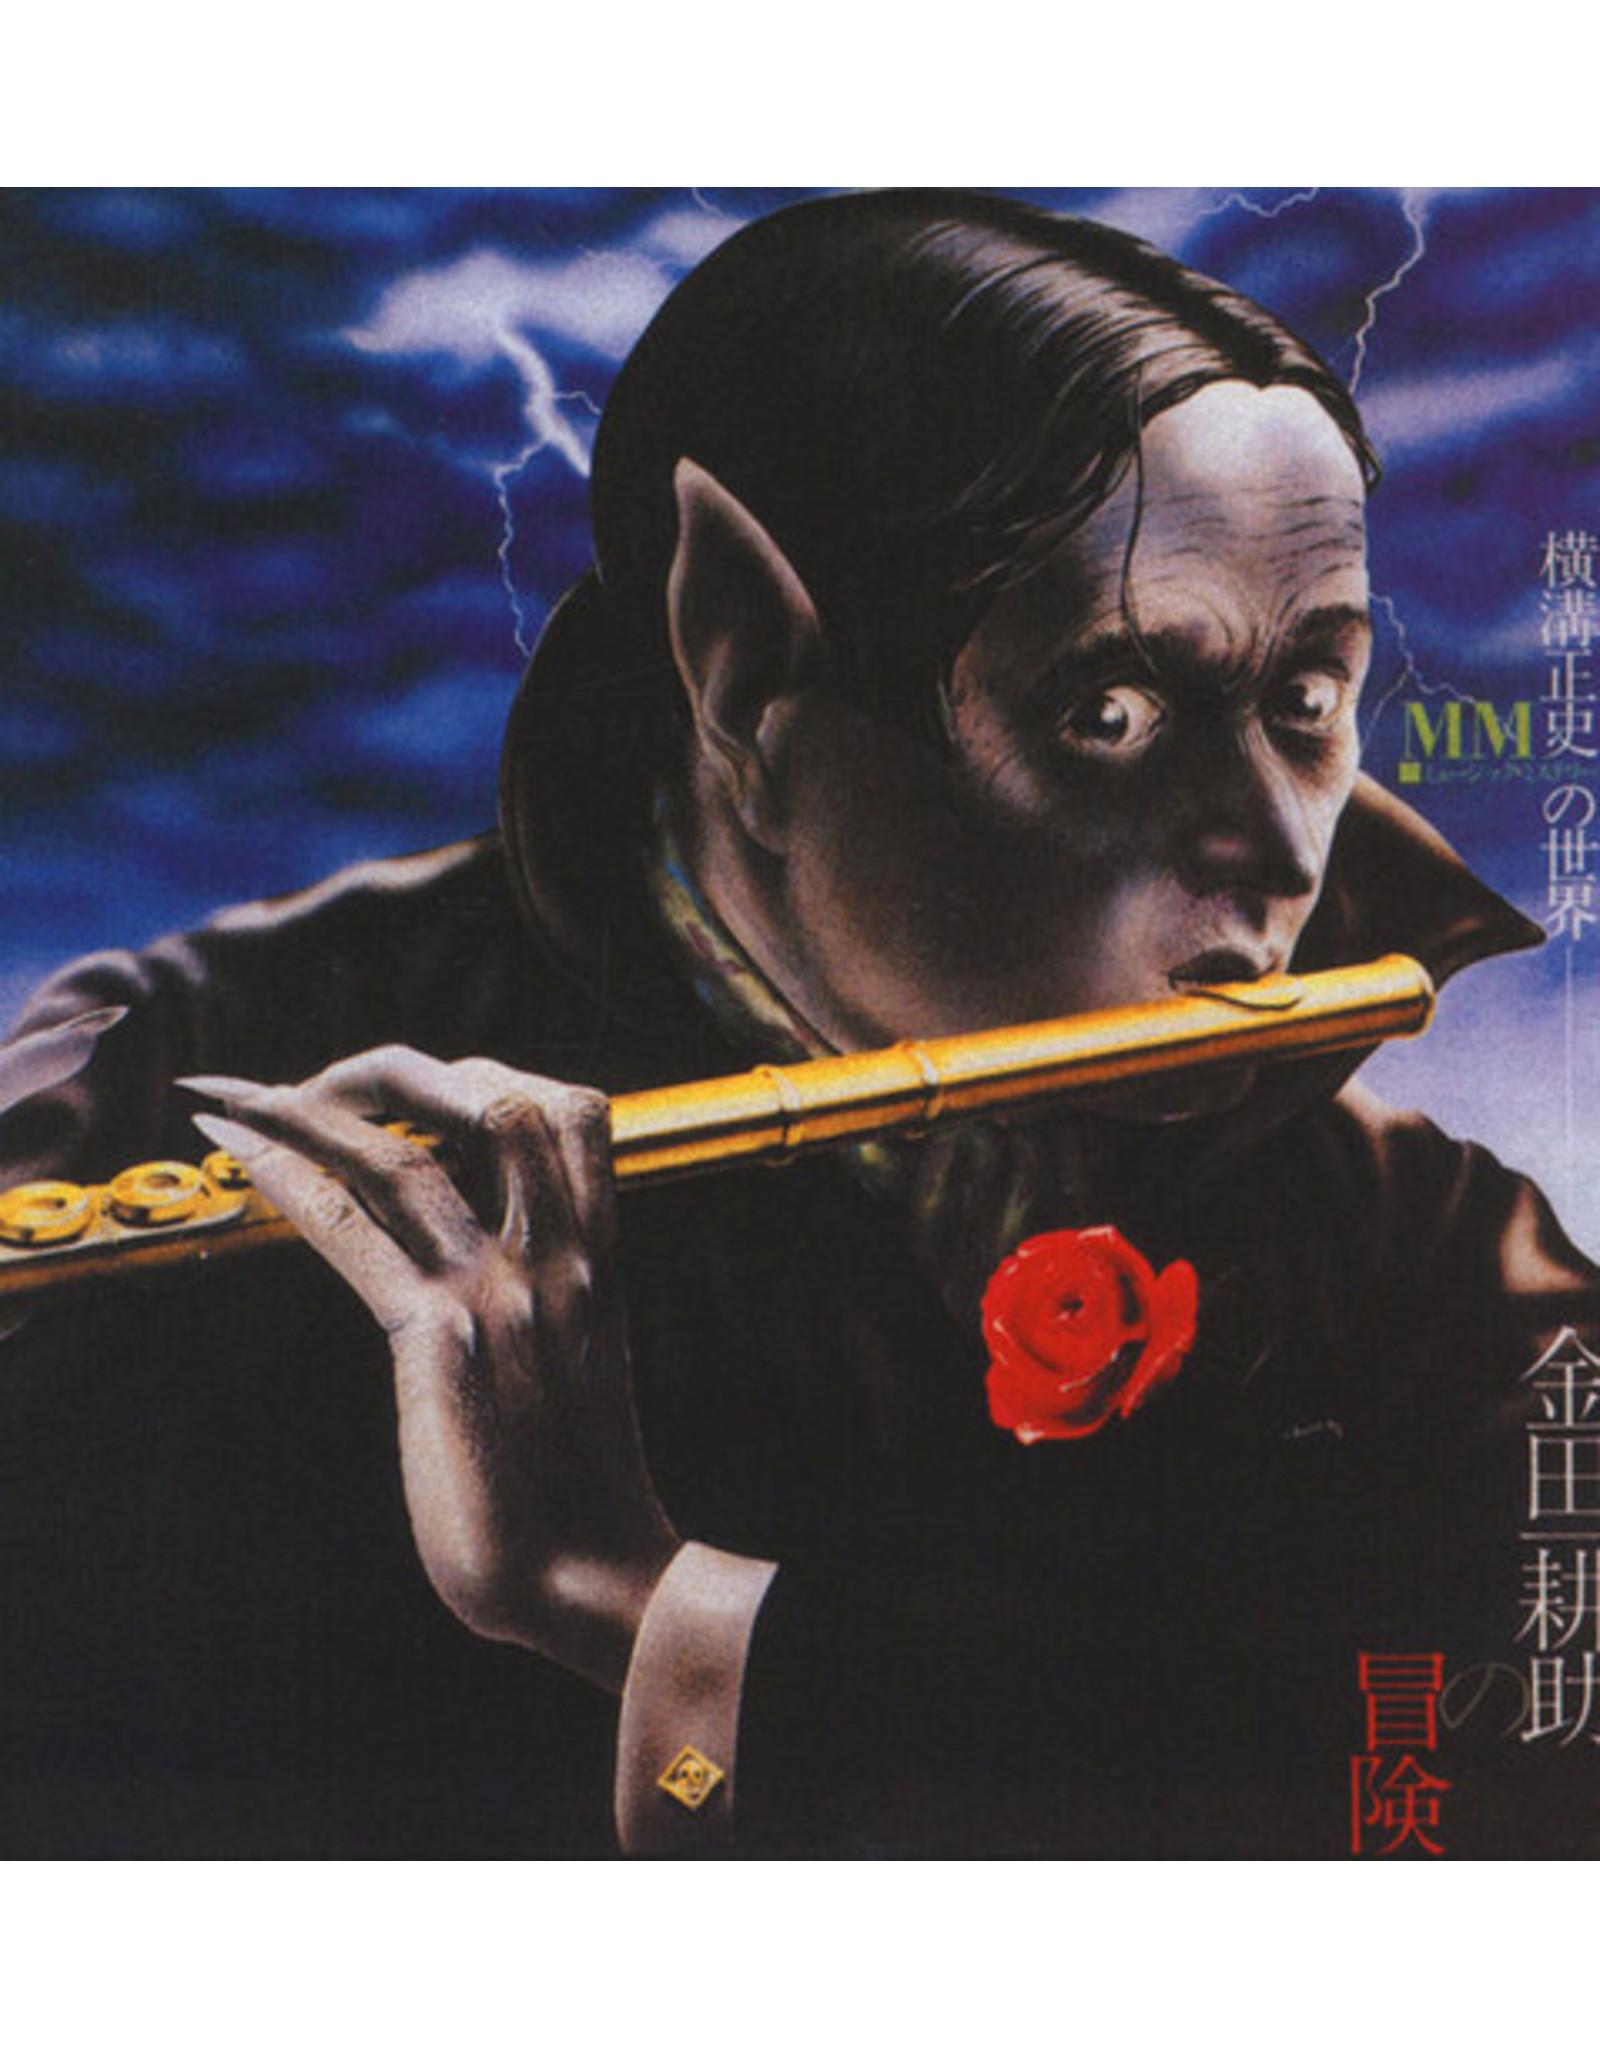 The Mystery Kindaichi Band - The Adventures Of Kindaichi Kosuke OST LP